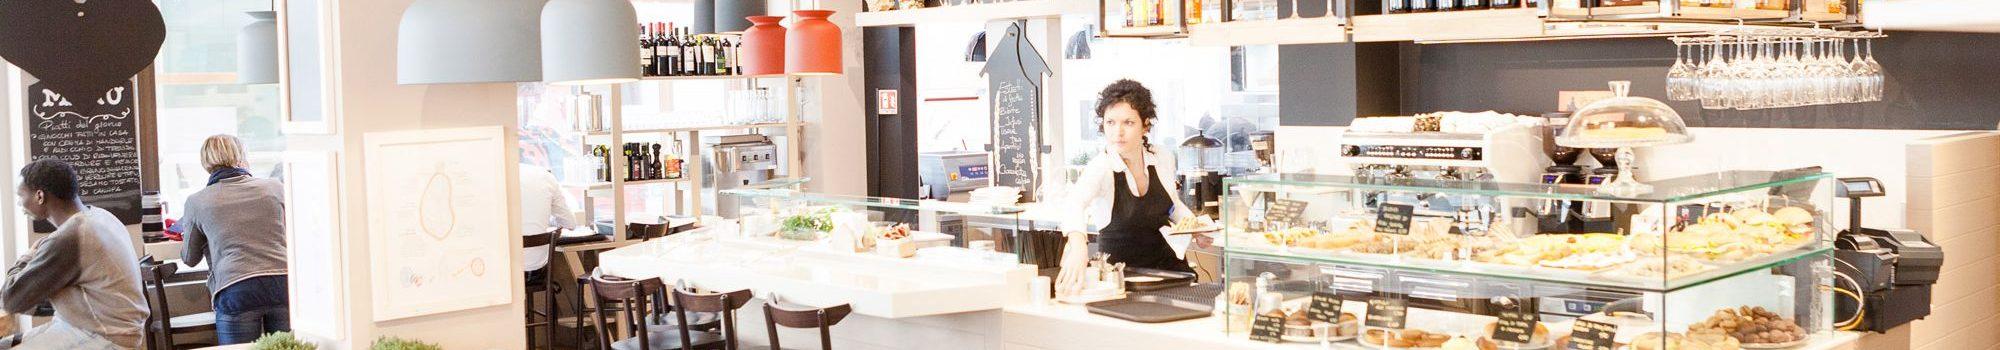 Bar e caffetterie con Electrolux Professional